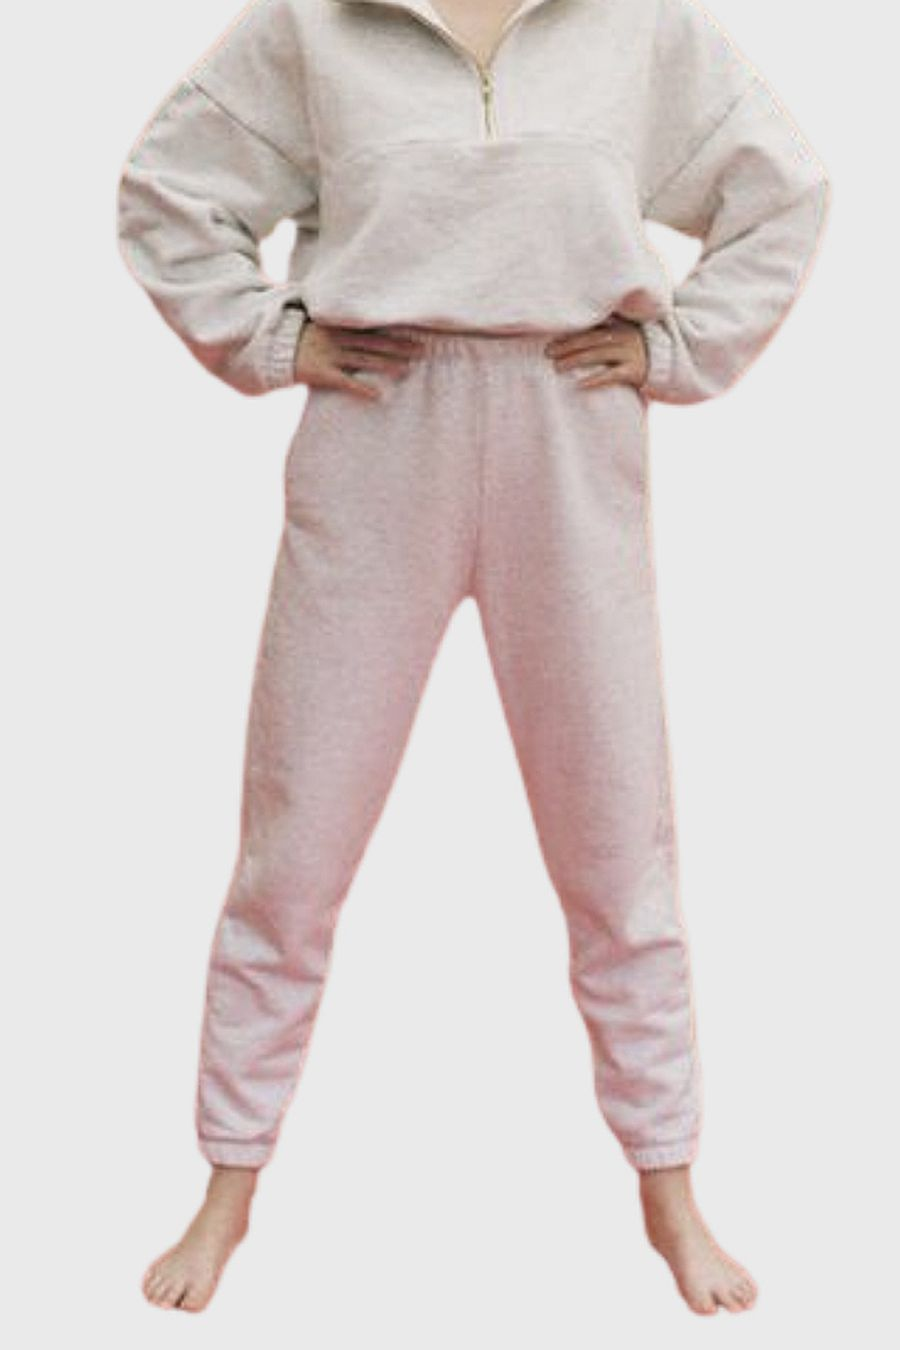 Gil Rodriguez Beachwood sweatpants - Ash Grey